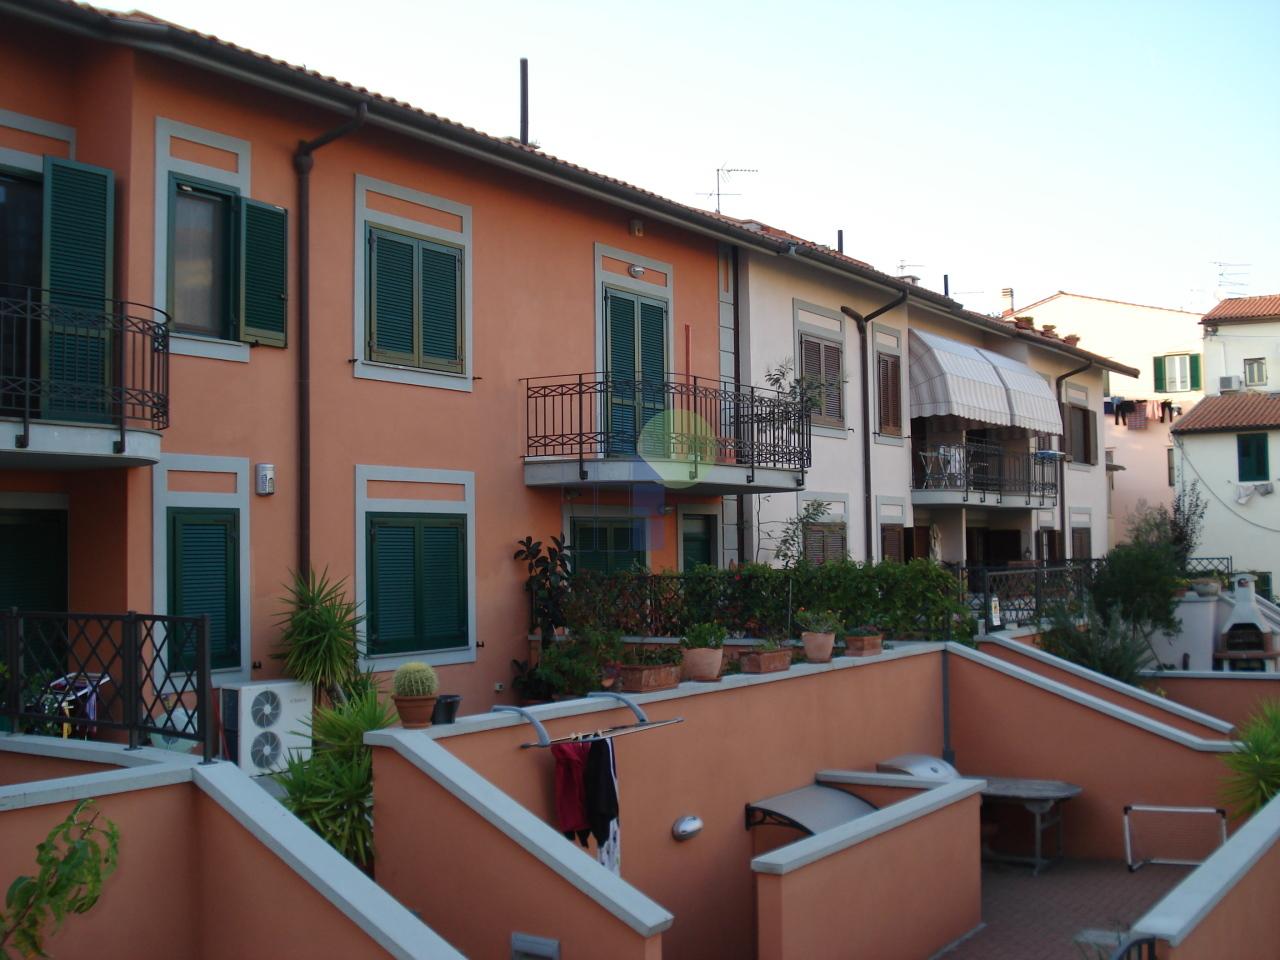 Bilocale Livorno Via Poli 12